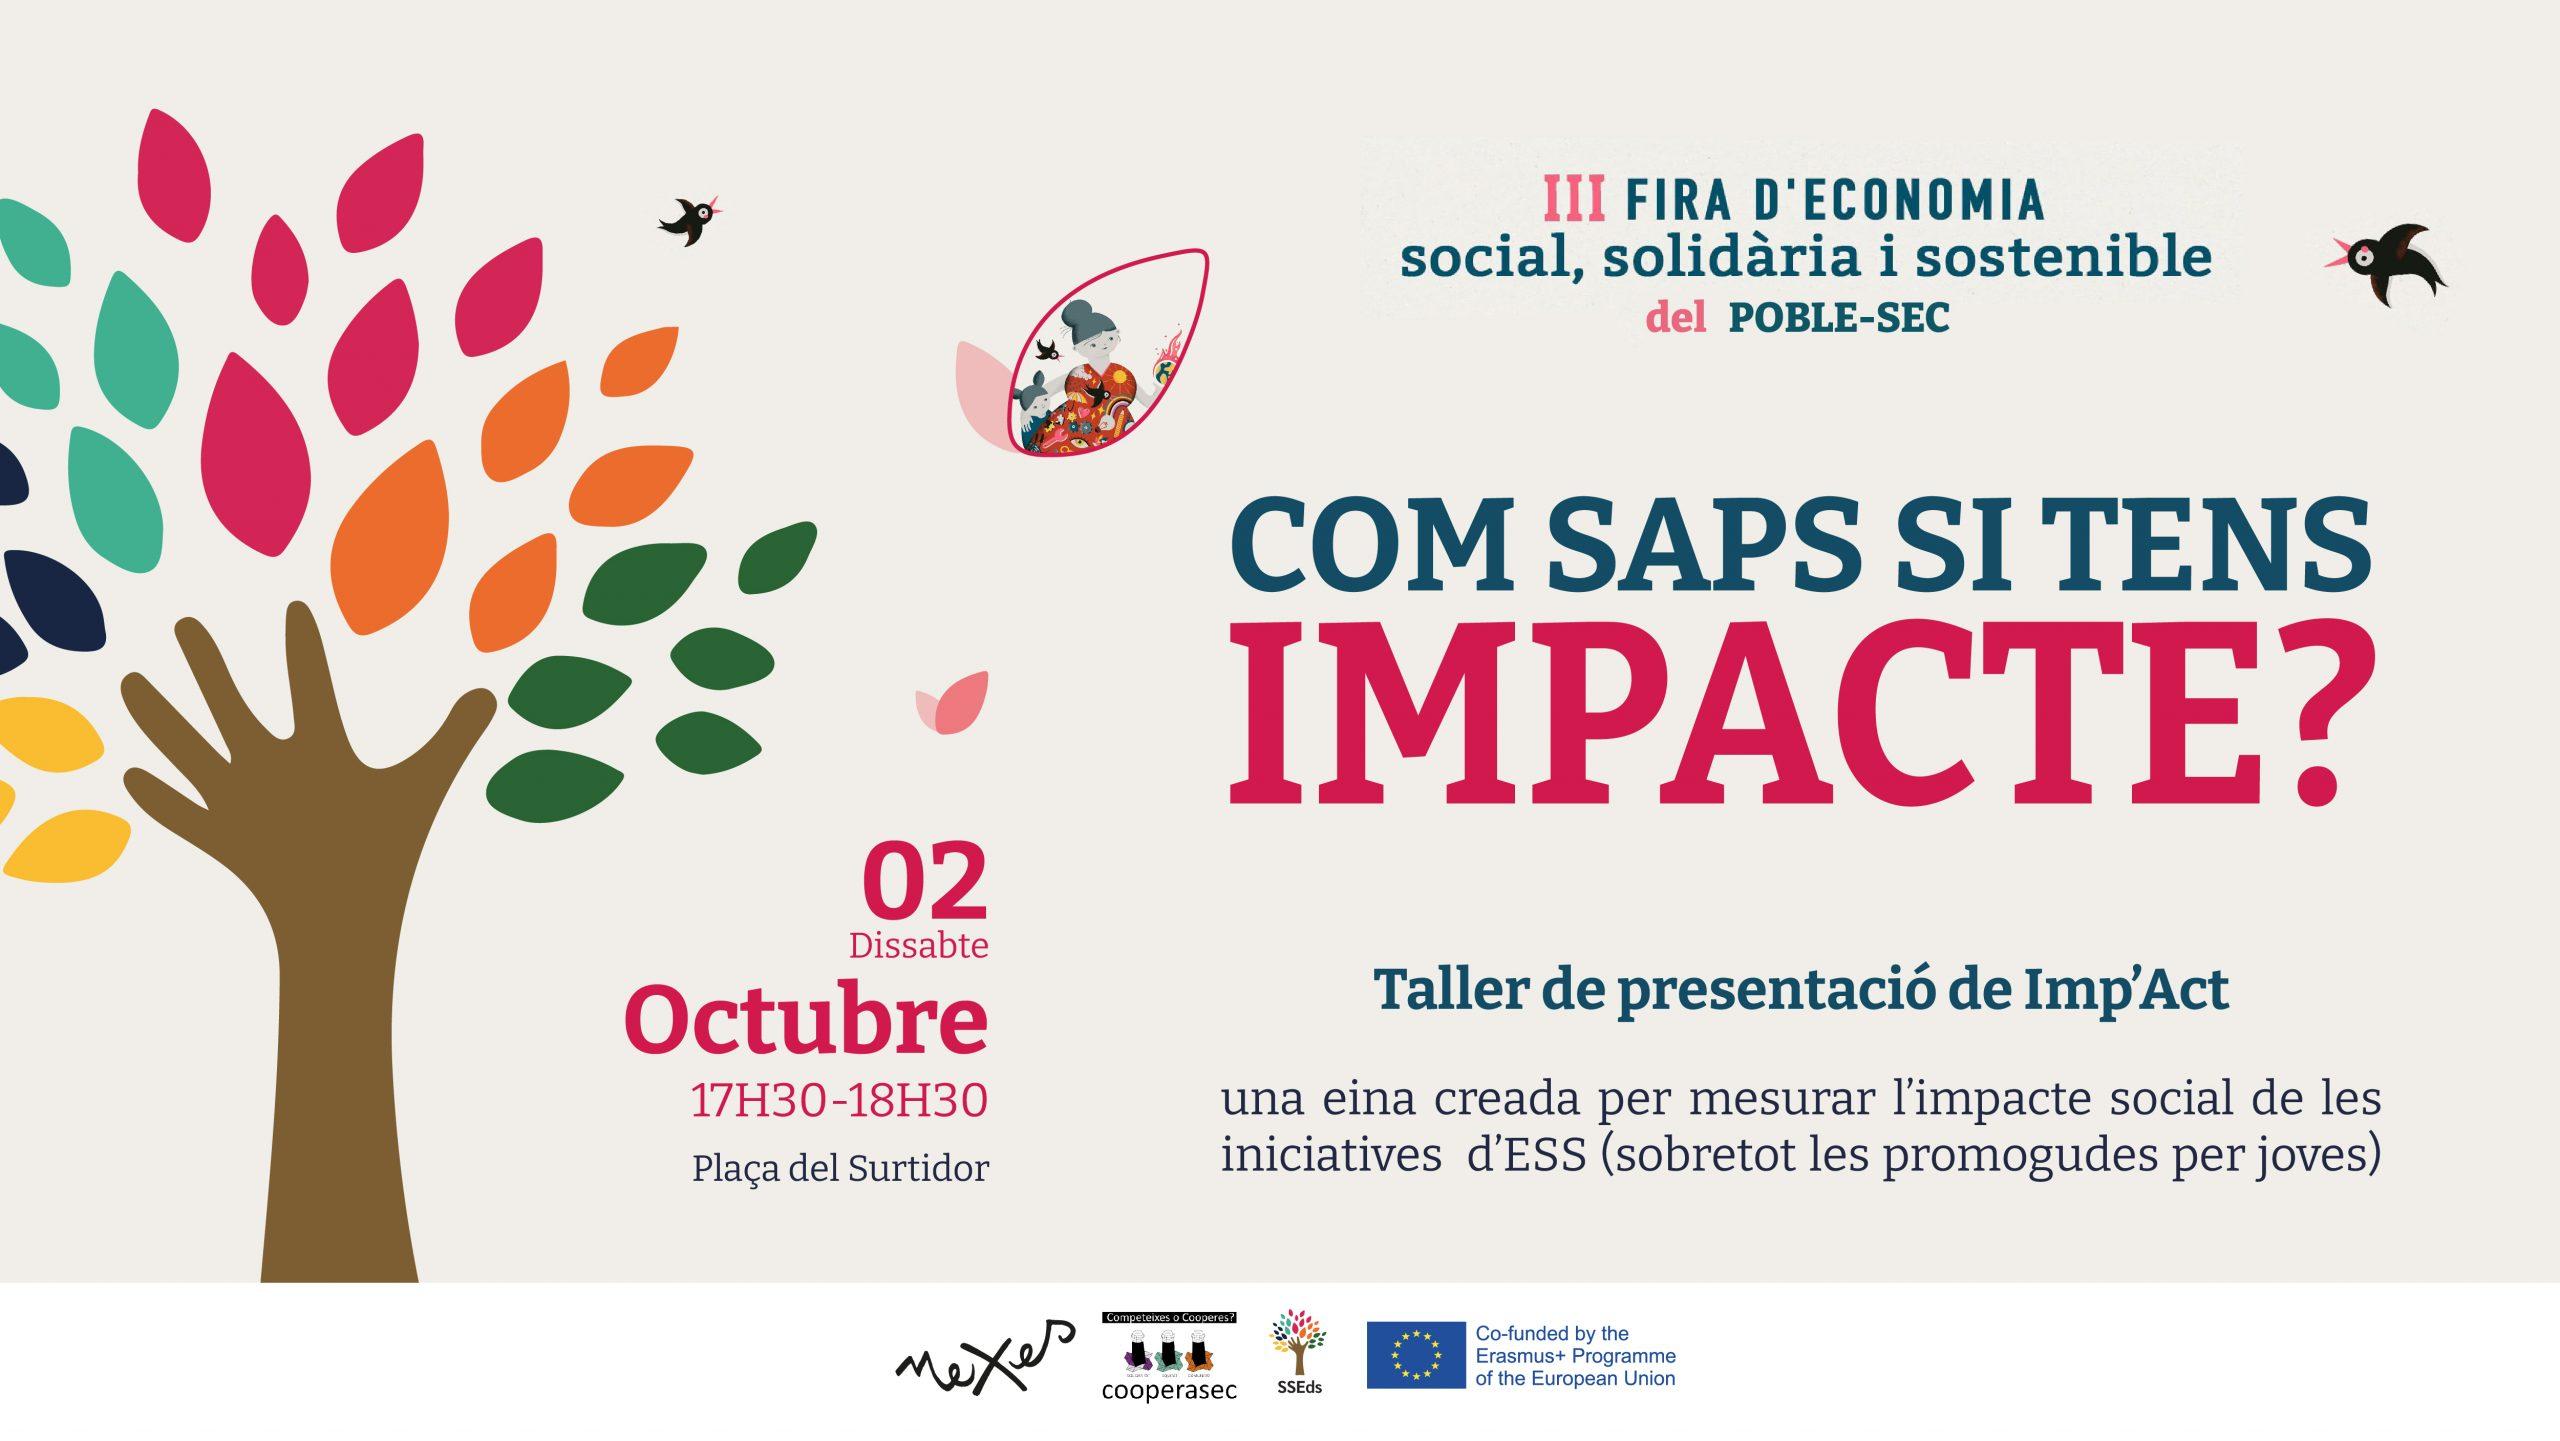 Presentation of the Imp'act Tool in the III Fira d'economia social, solidària i sostenible del Poble-sec